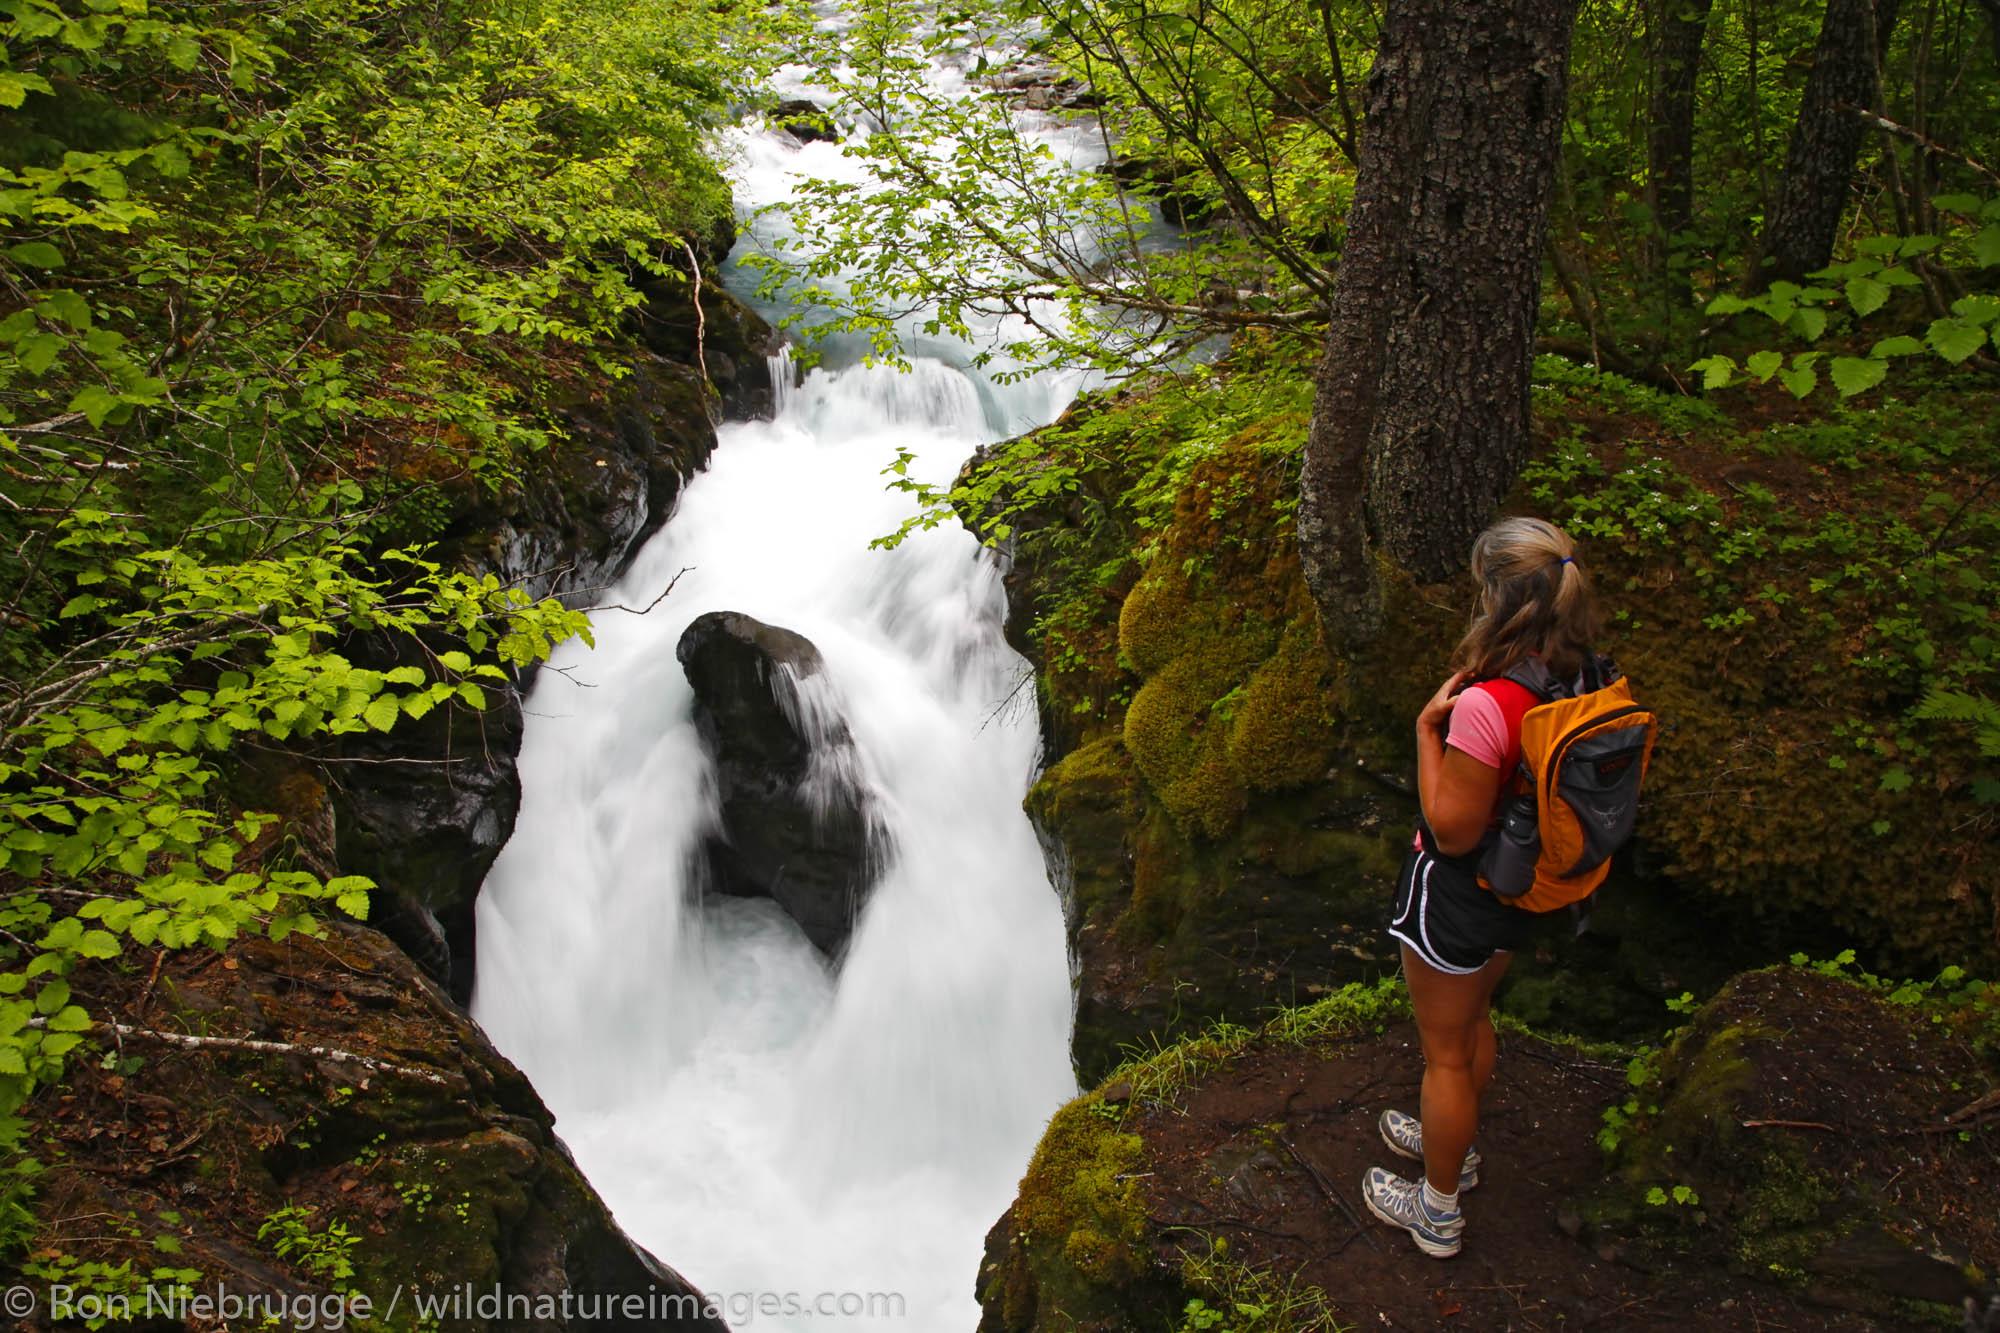 A hiker views the Winner Creek Gorge, Winner Creek Gorge Trail, Girdwood, Chugach National Forest, Alaska. (MR)